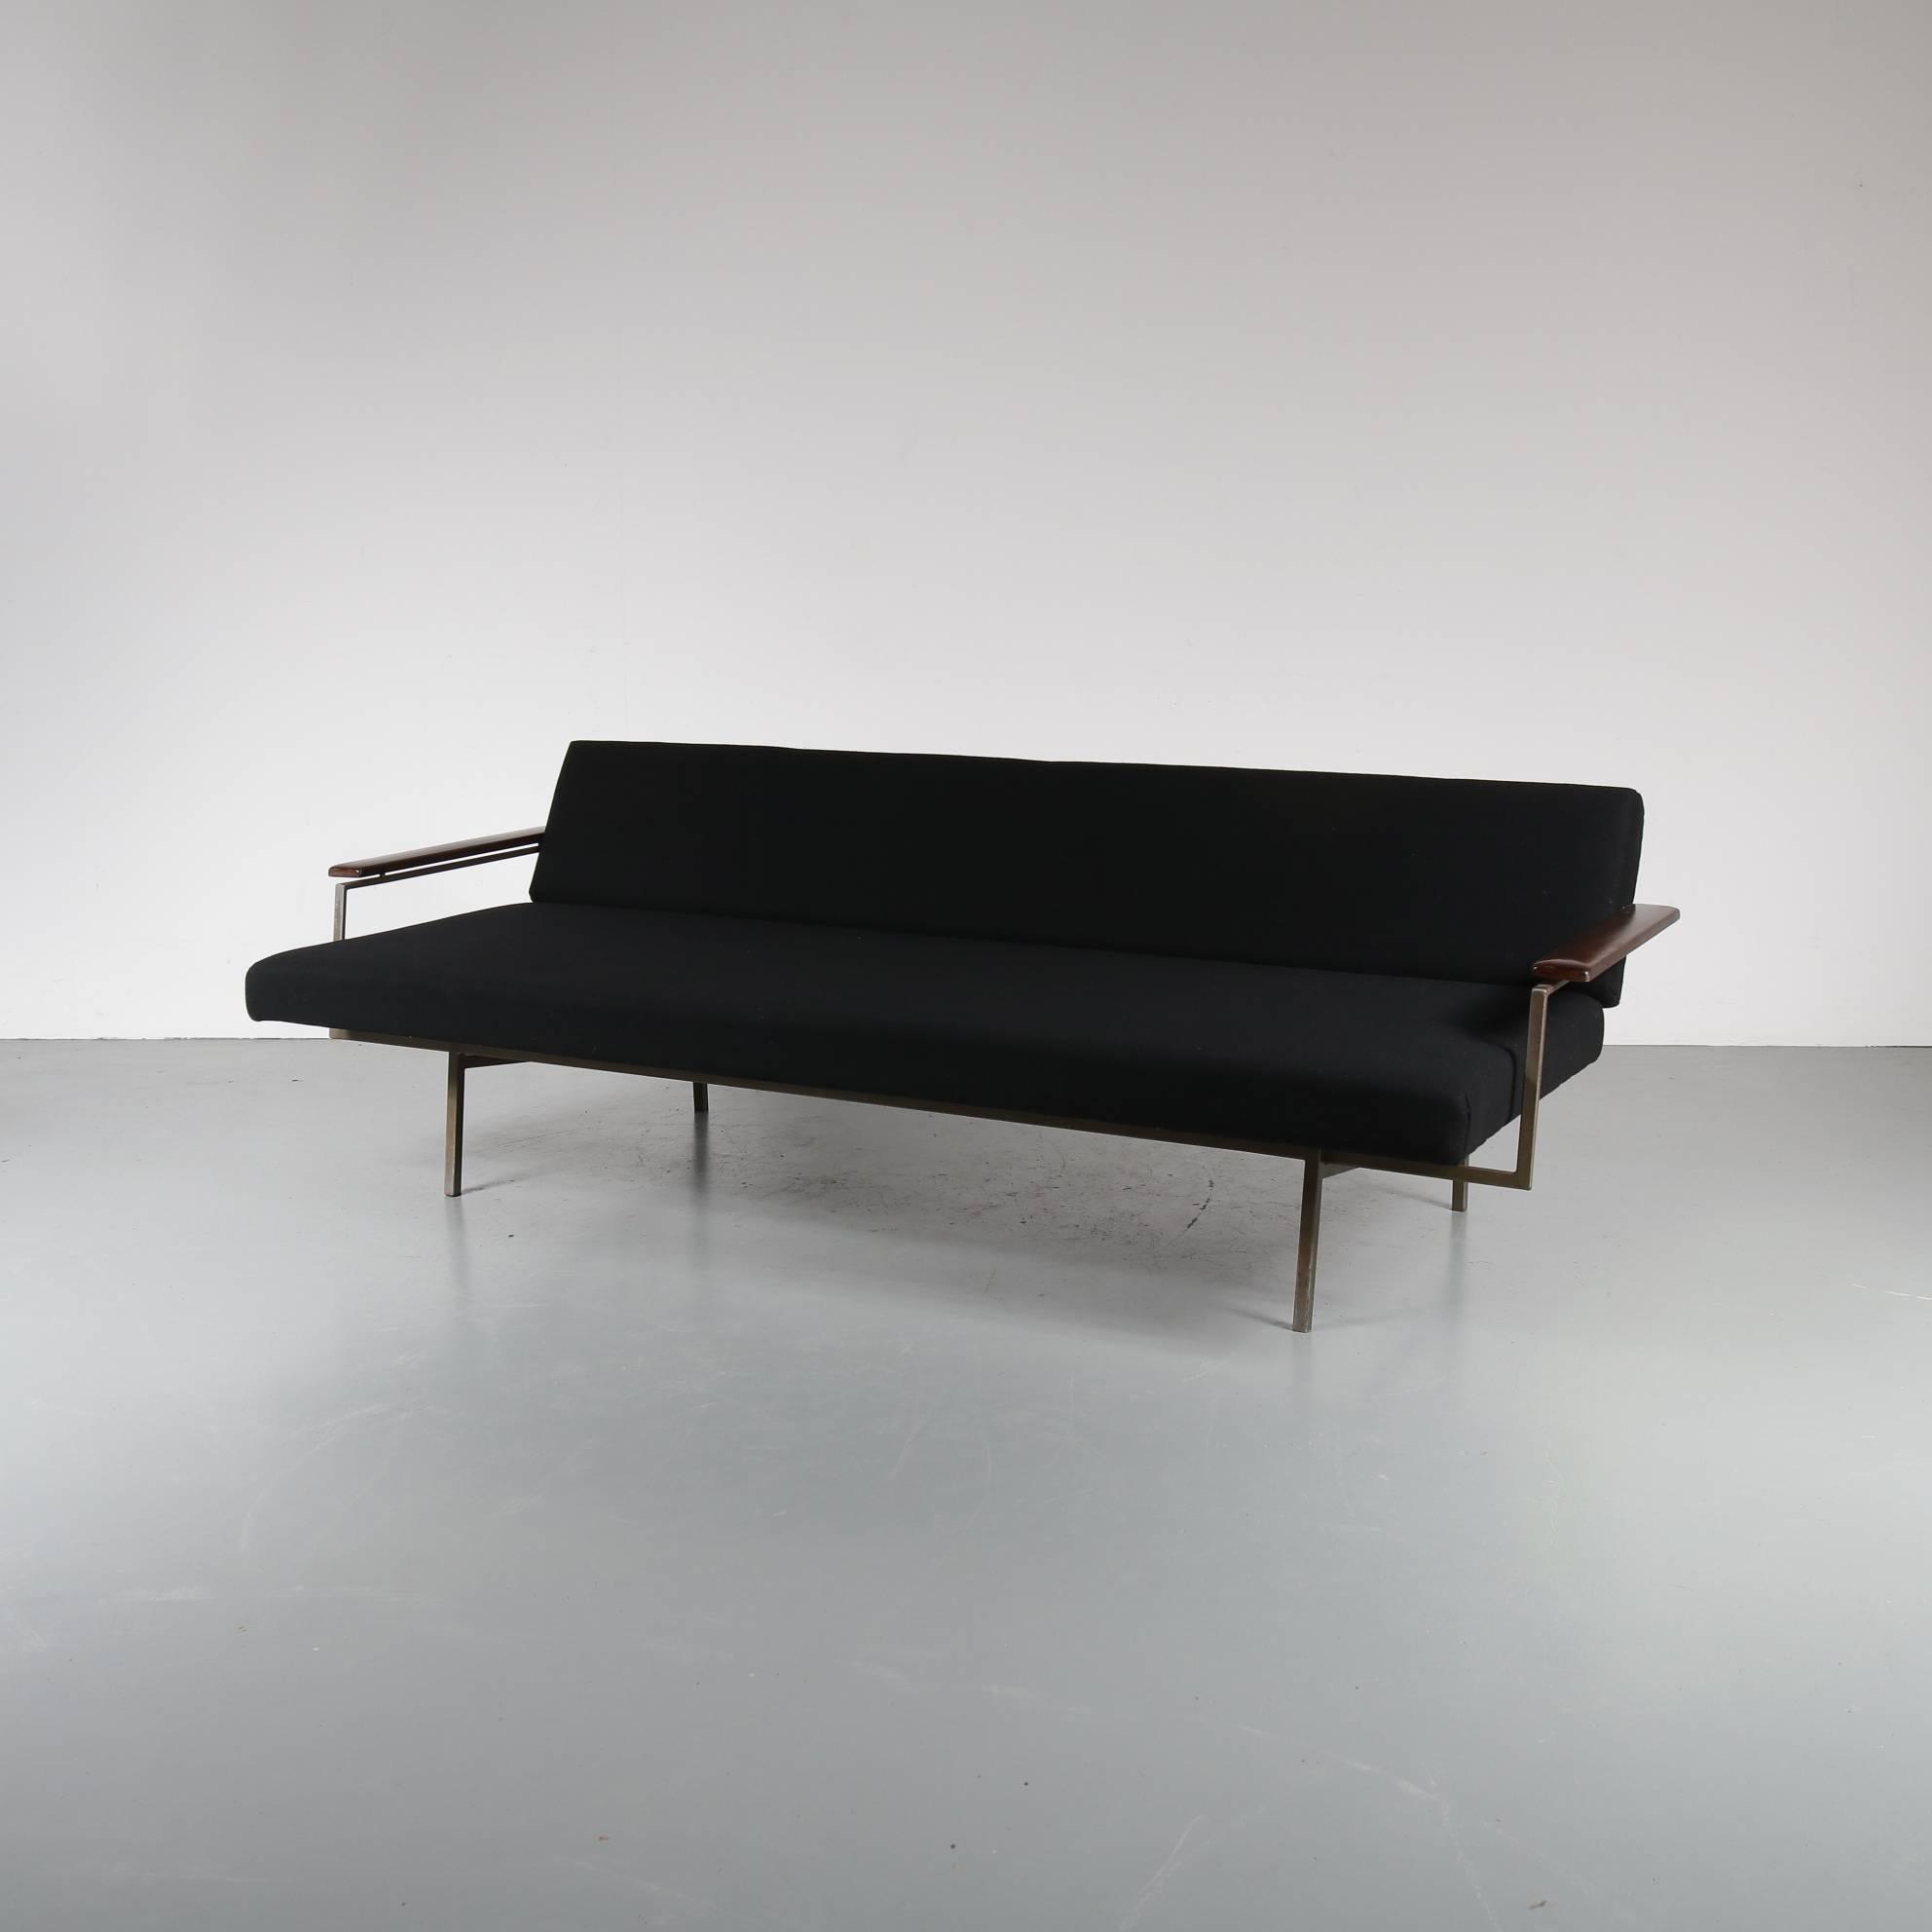 Bon Mid Century Modern Rob Parry Sleeping Sofa For Gelderland, Netherlands 1960  For Sale